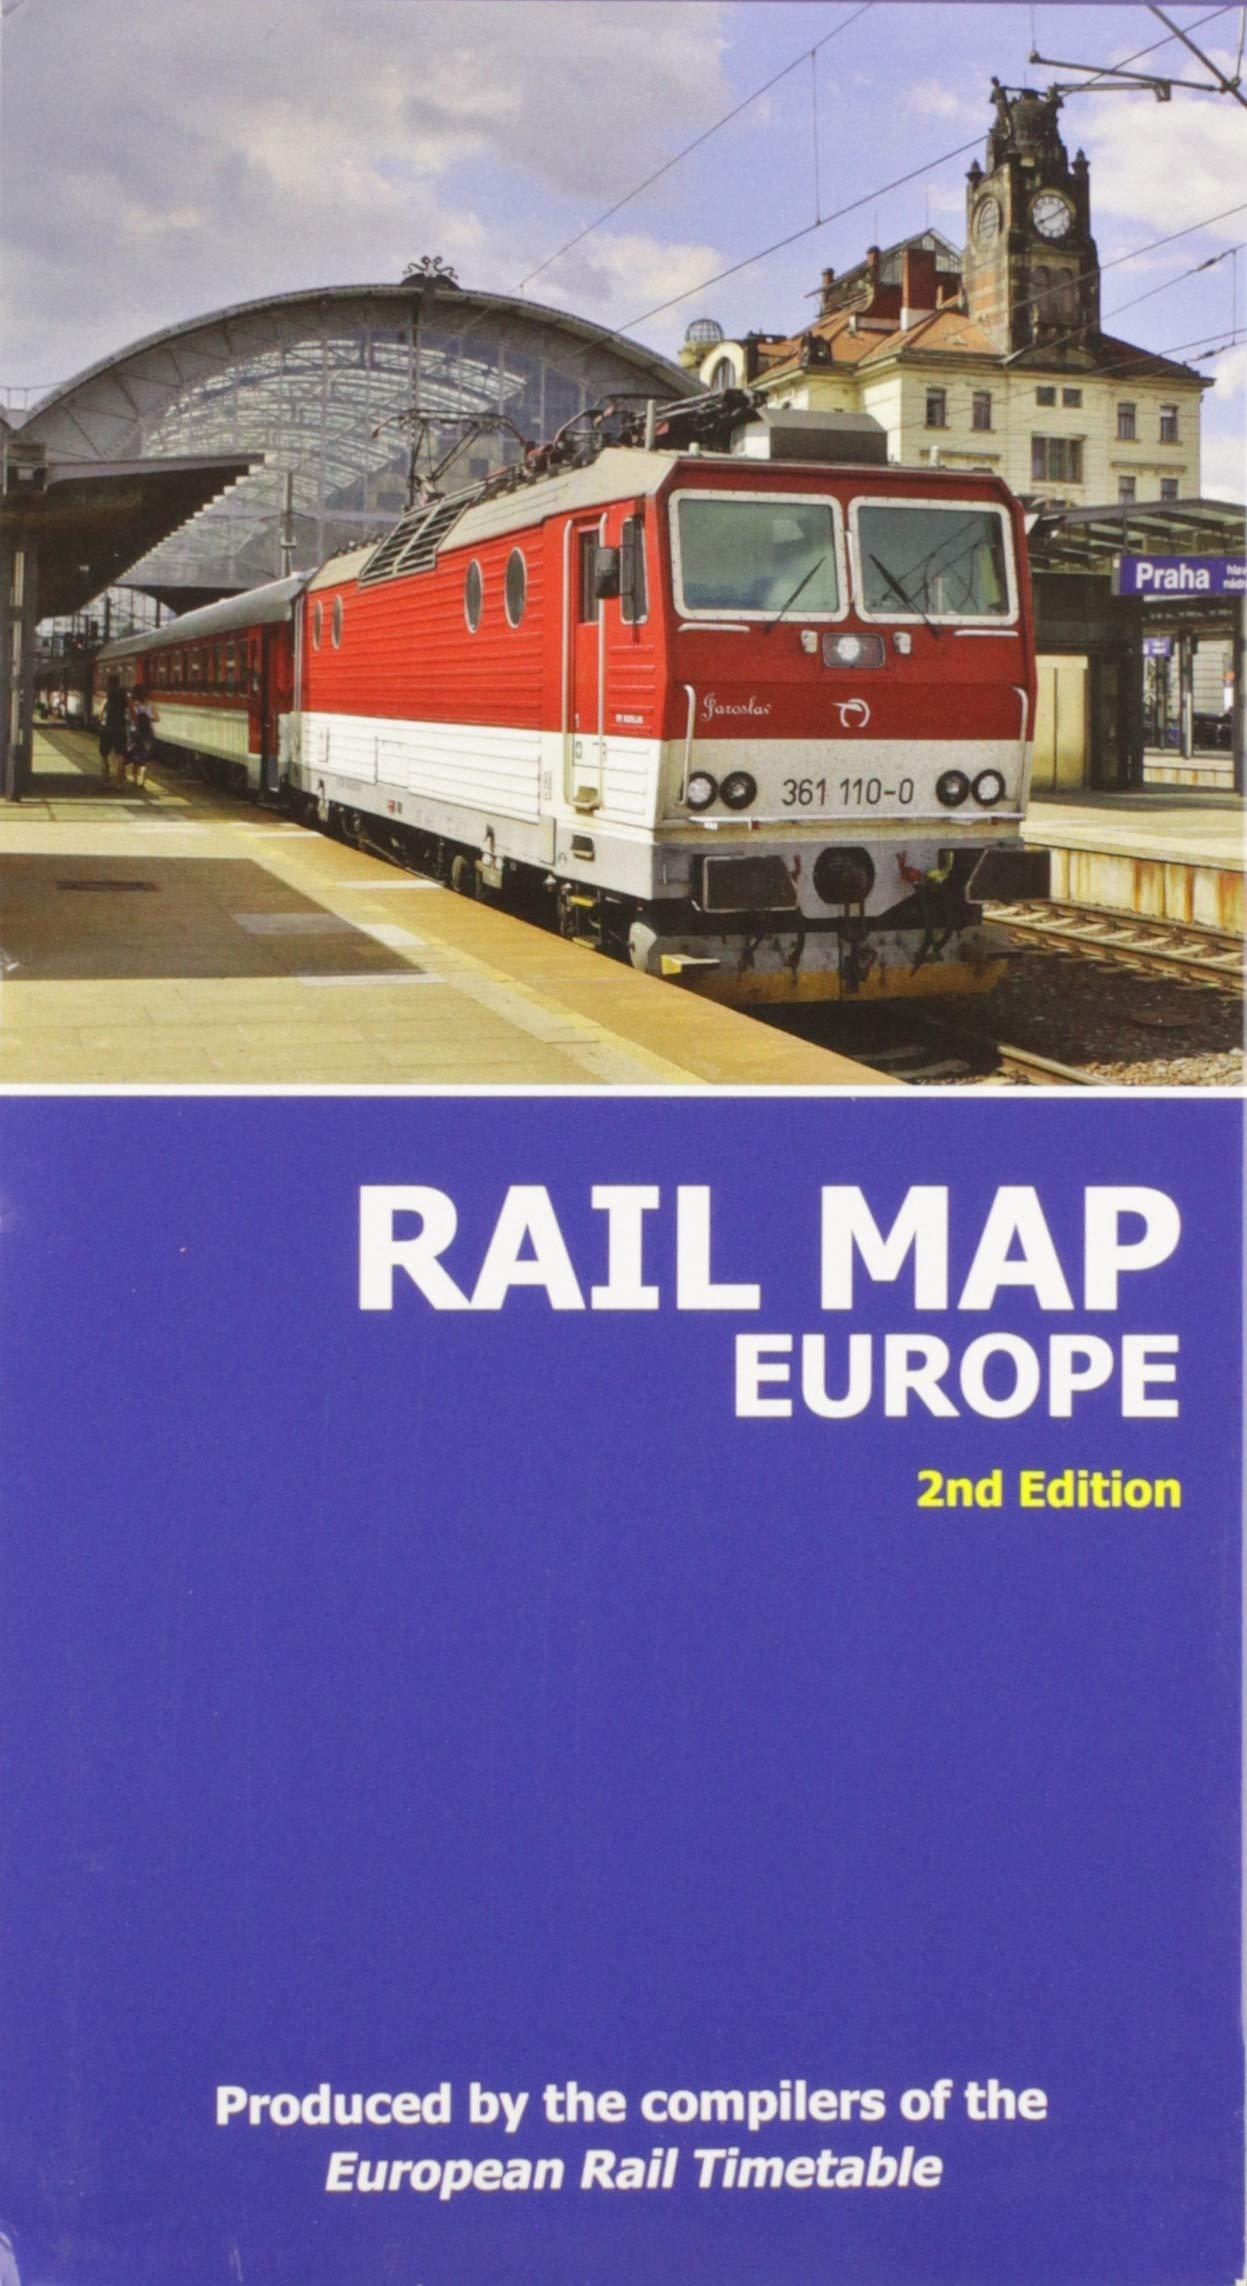 Rail Map of Europe: 2nd Edition: Amazon.co.uk: European Rail ...